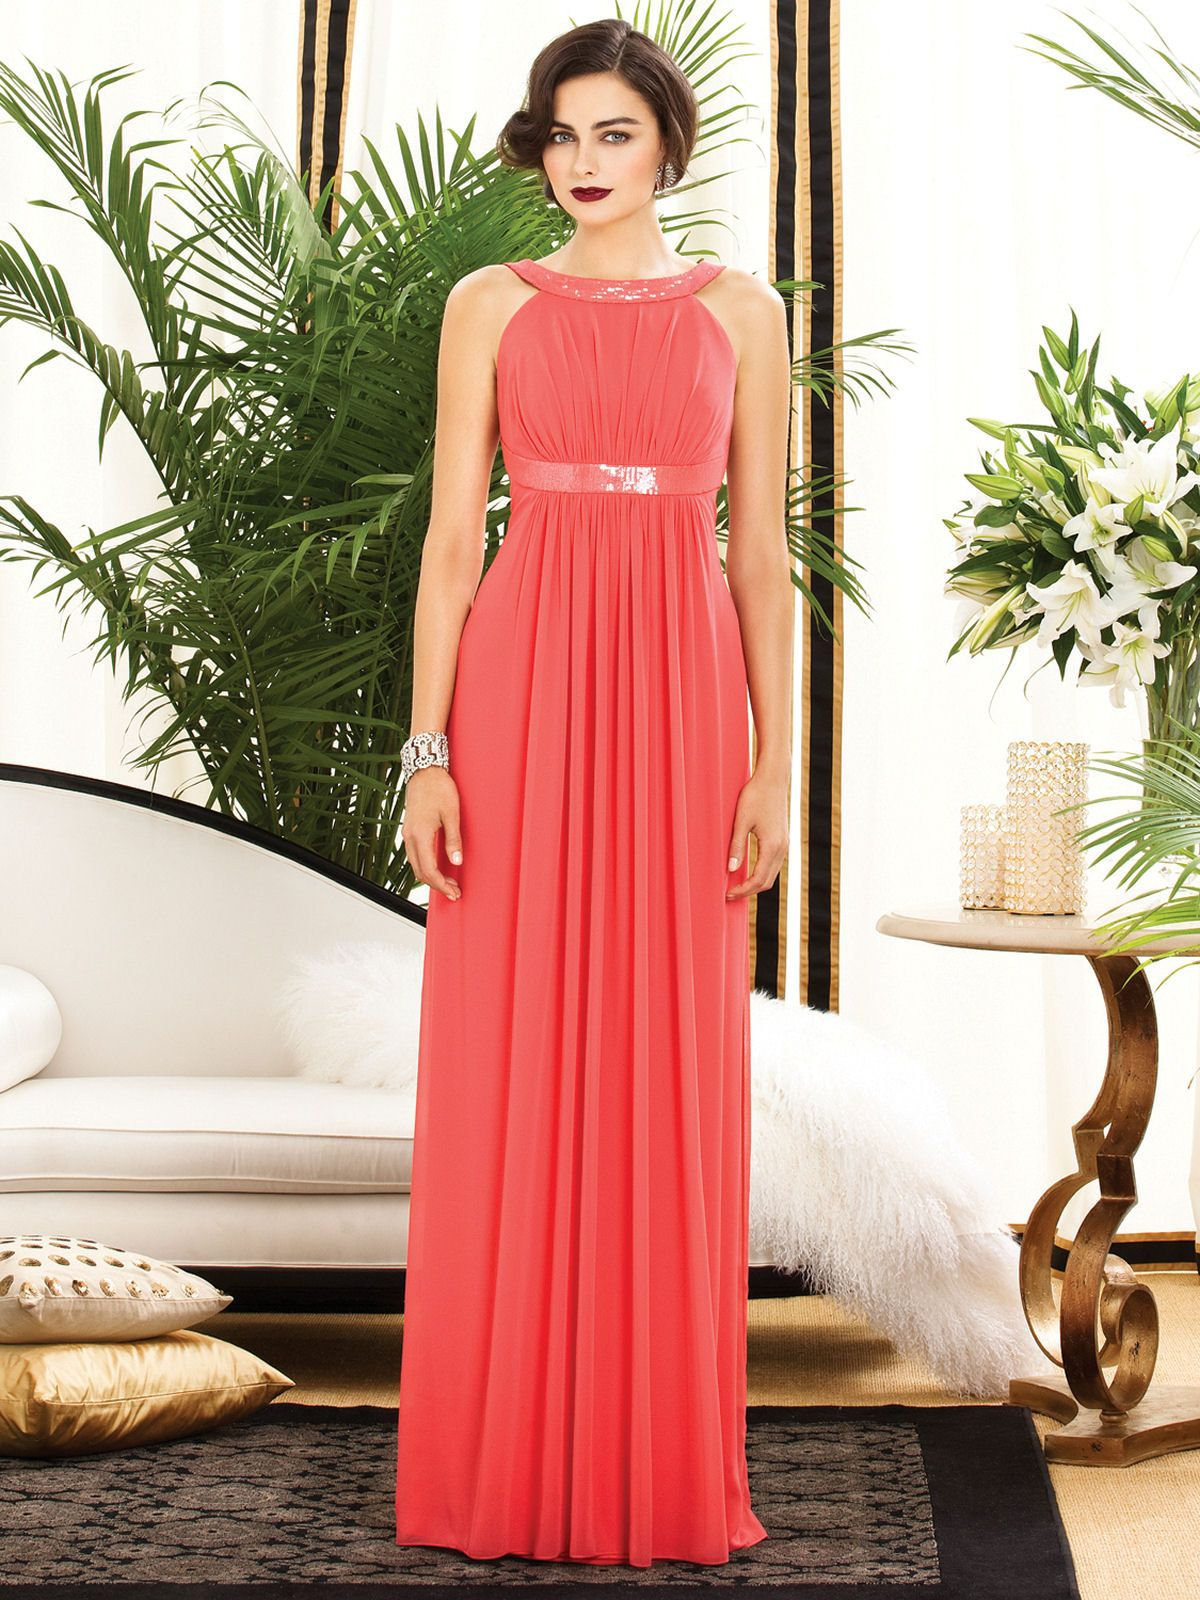 Dessy firecracker 2889 wedding pinterest wedding dress halterneck orange bridesmaid dress from dessy ombrellifo Gallery